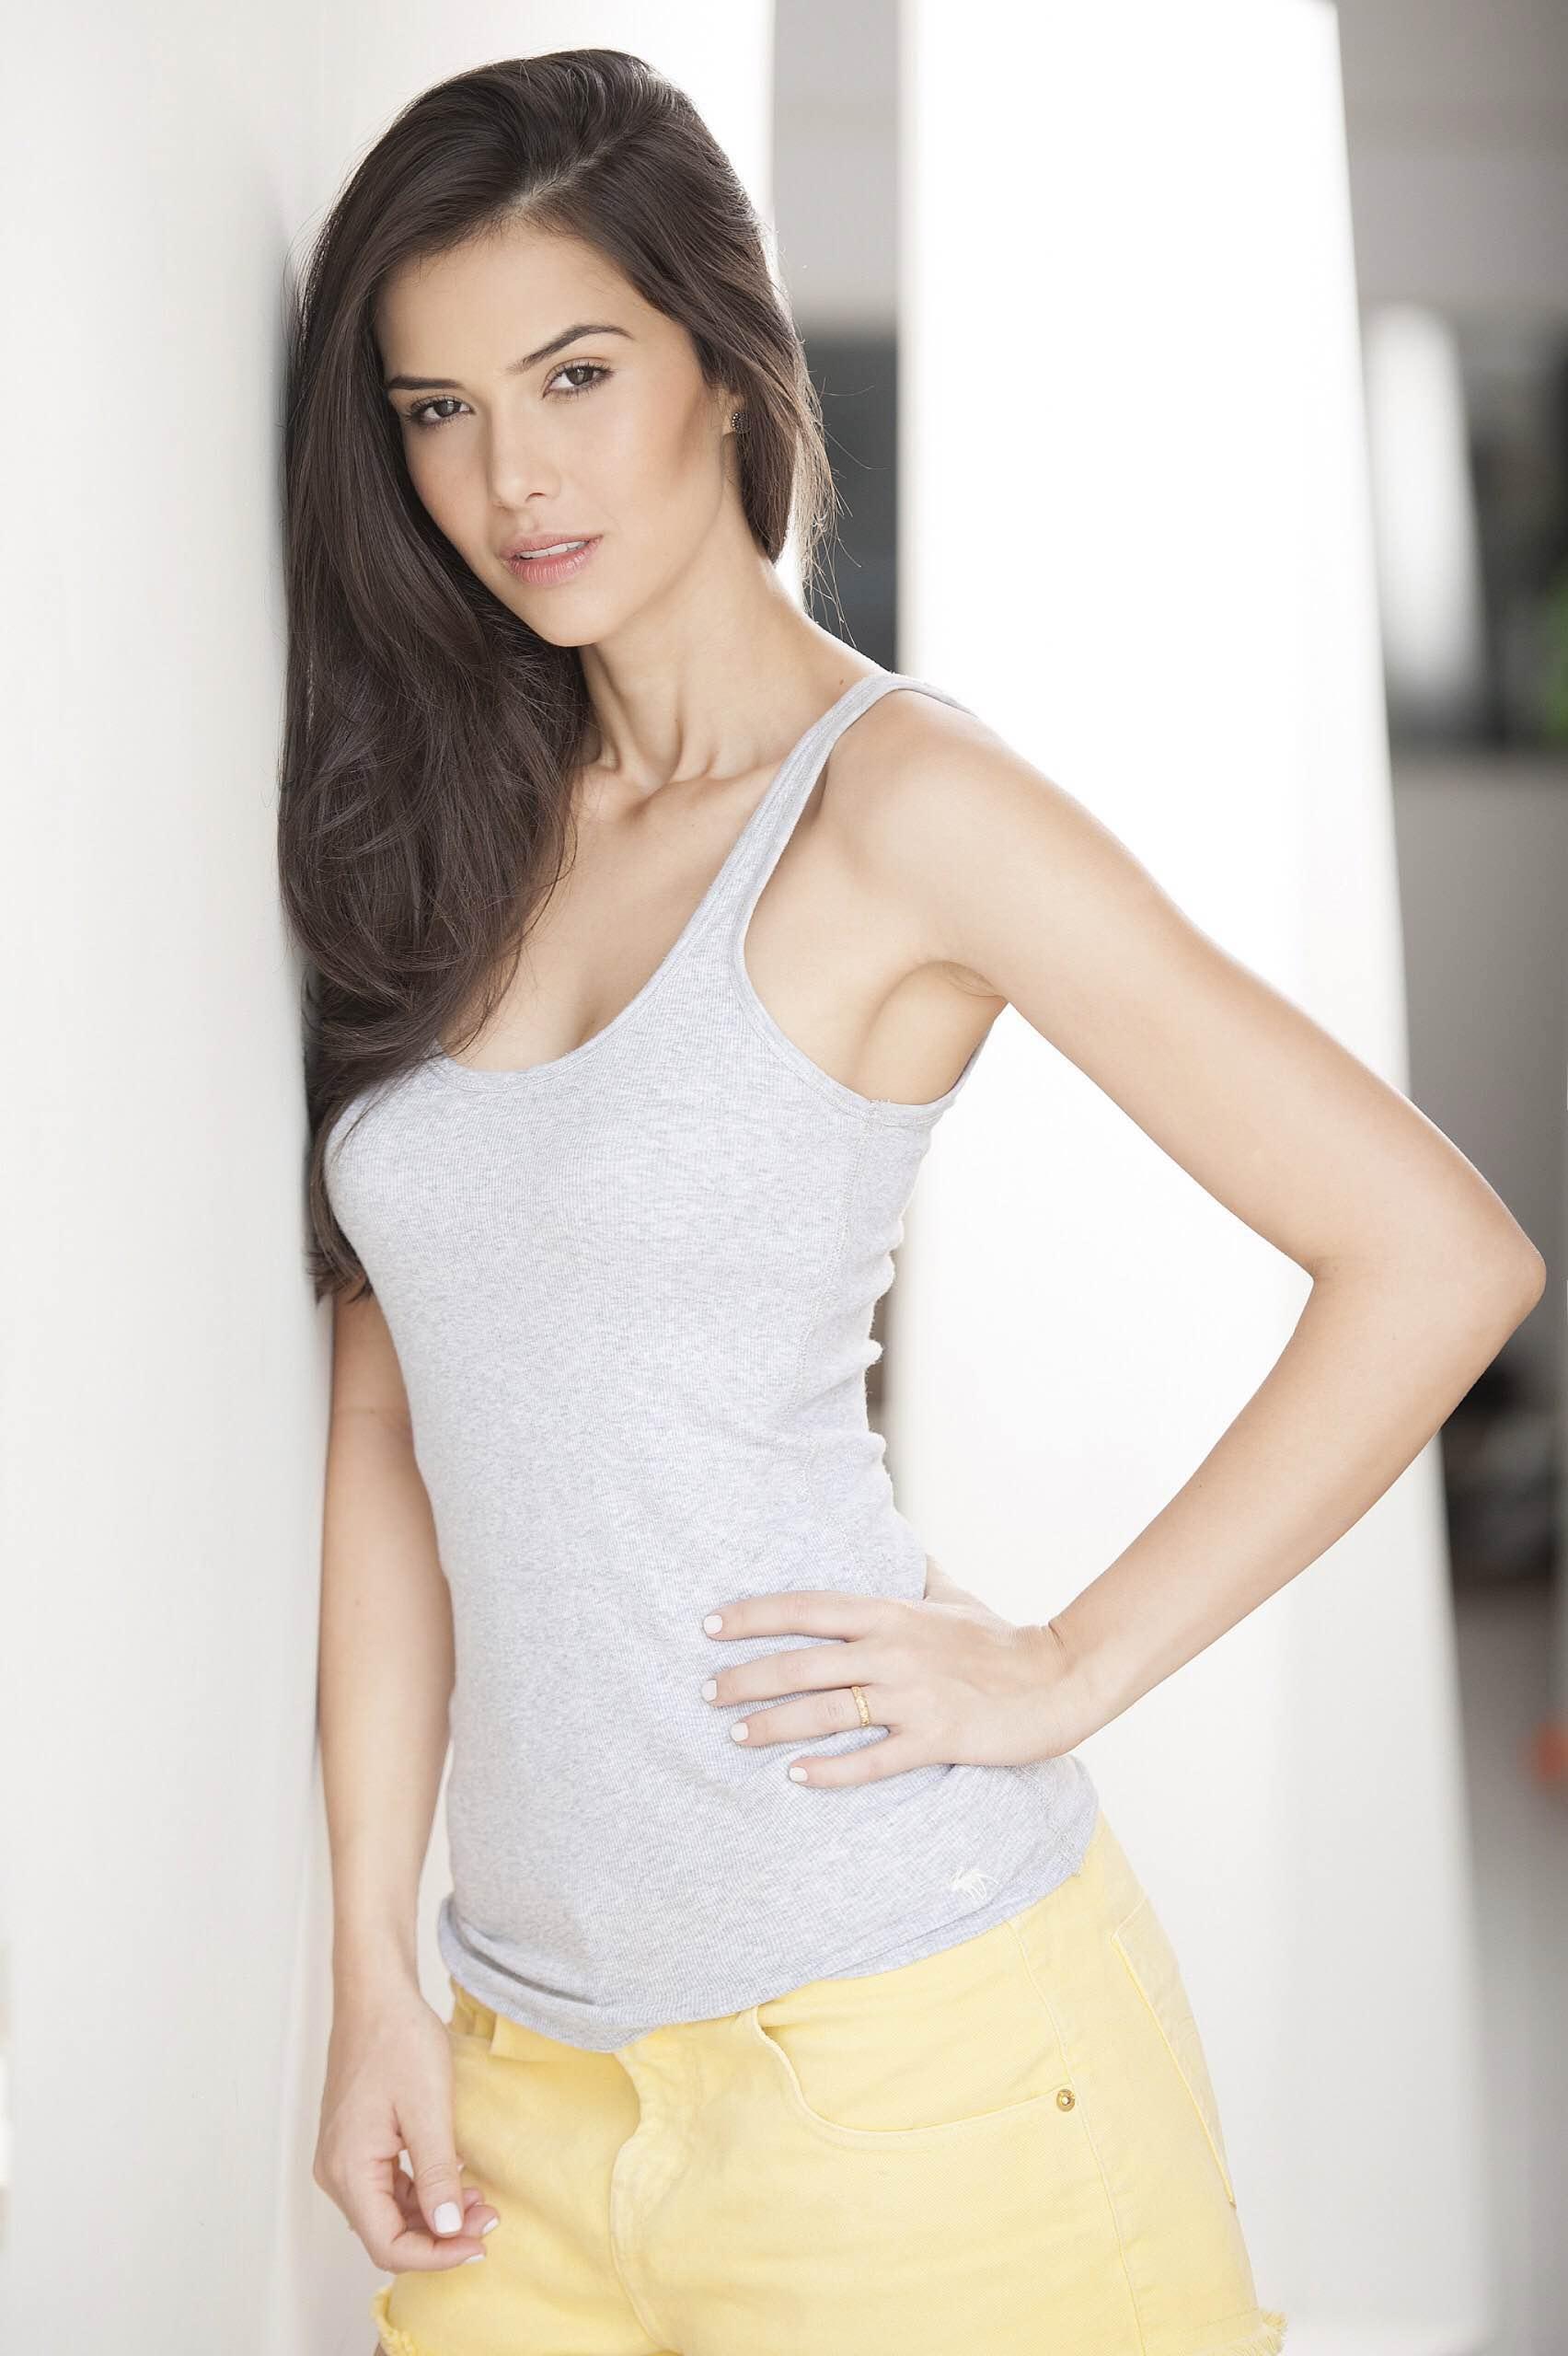 camila brant, miss brasil earth 2012. I65xc8if